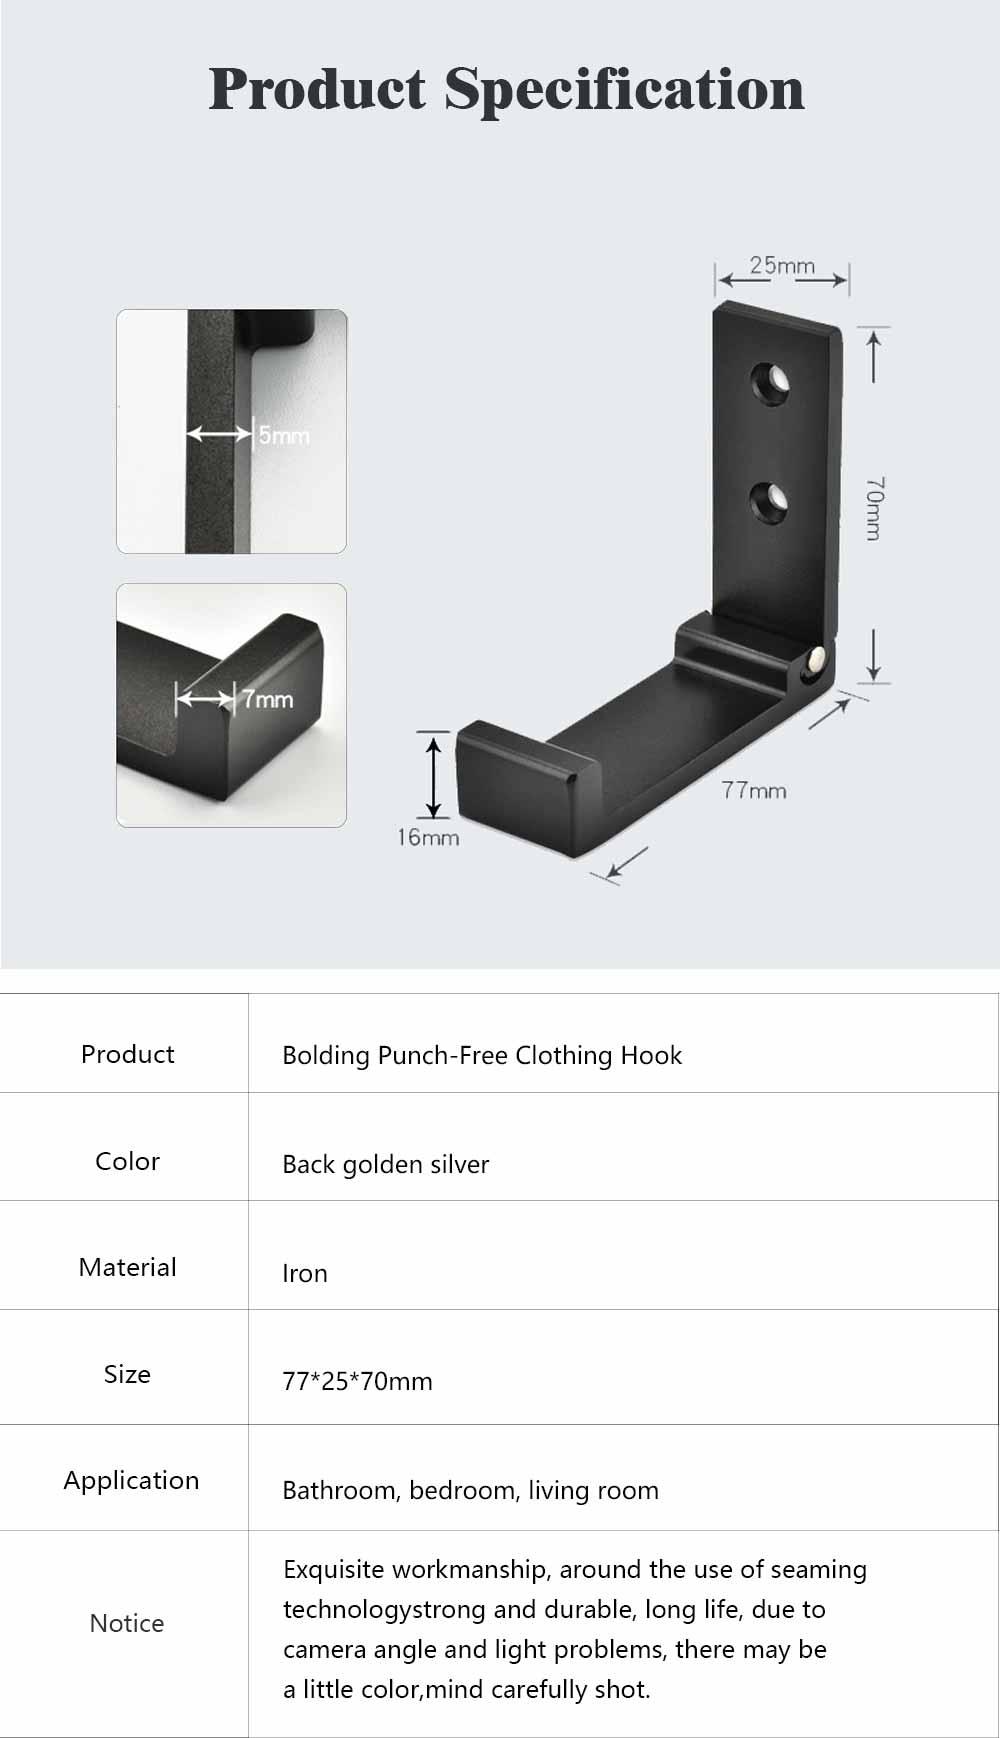 Metal Hook for Garments Tops Shorts Dress, Creative Folding Punch-Free Clothing Hook Universal Aluminum Hanger 6